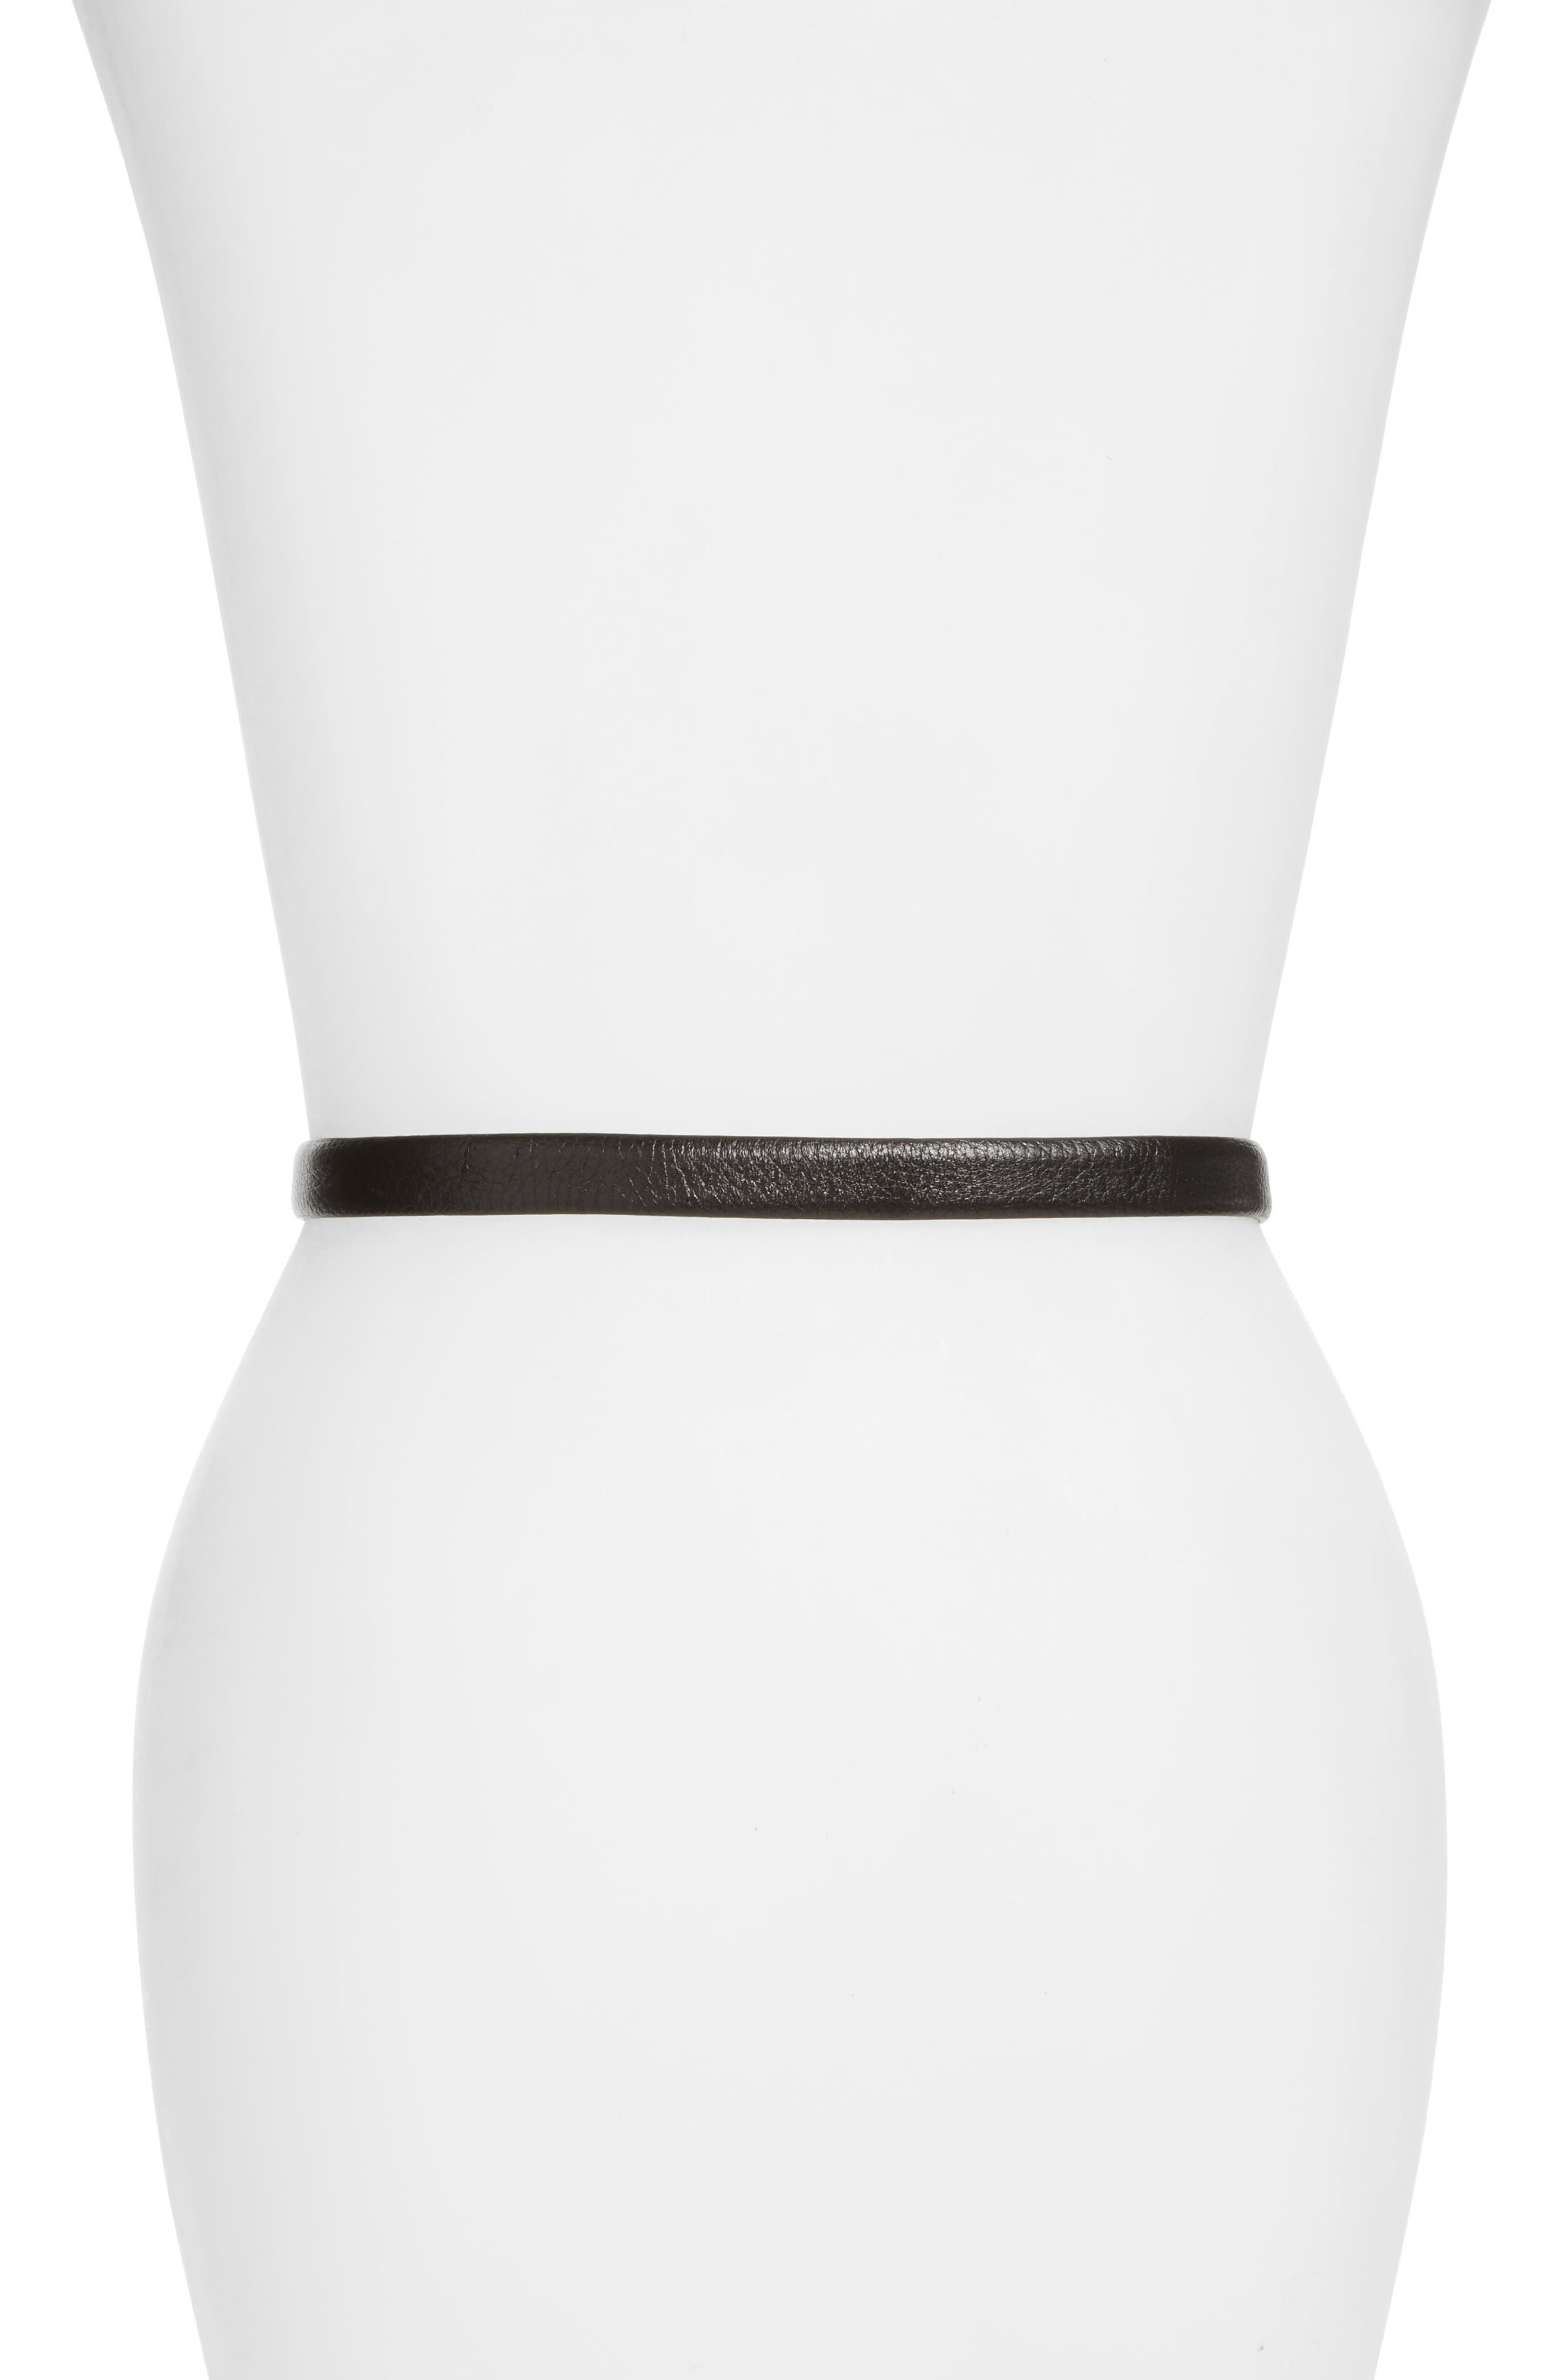 MOSCHINO, Logo Leather Skinny Belt, Alternate thumbnail 2, color, BLACK